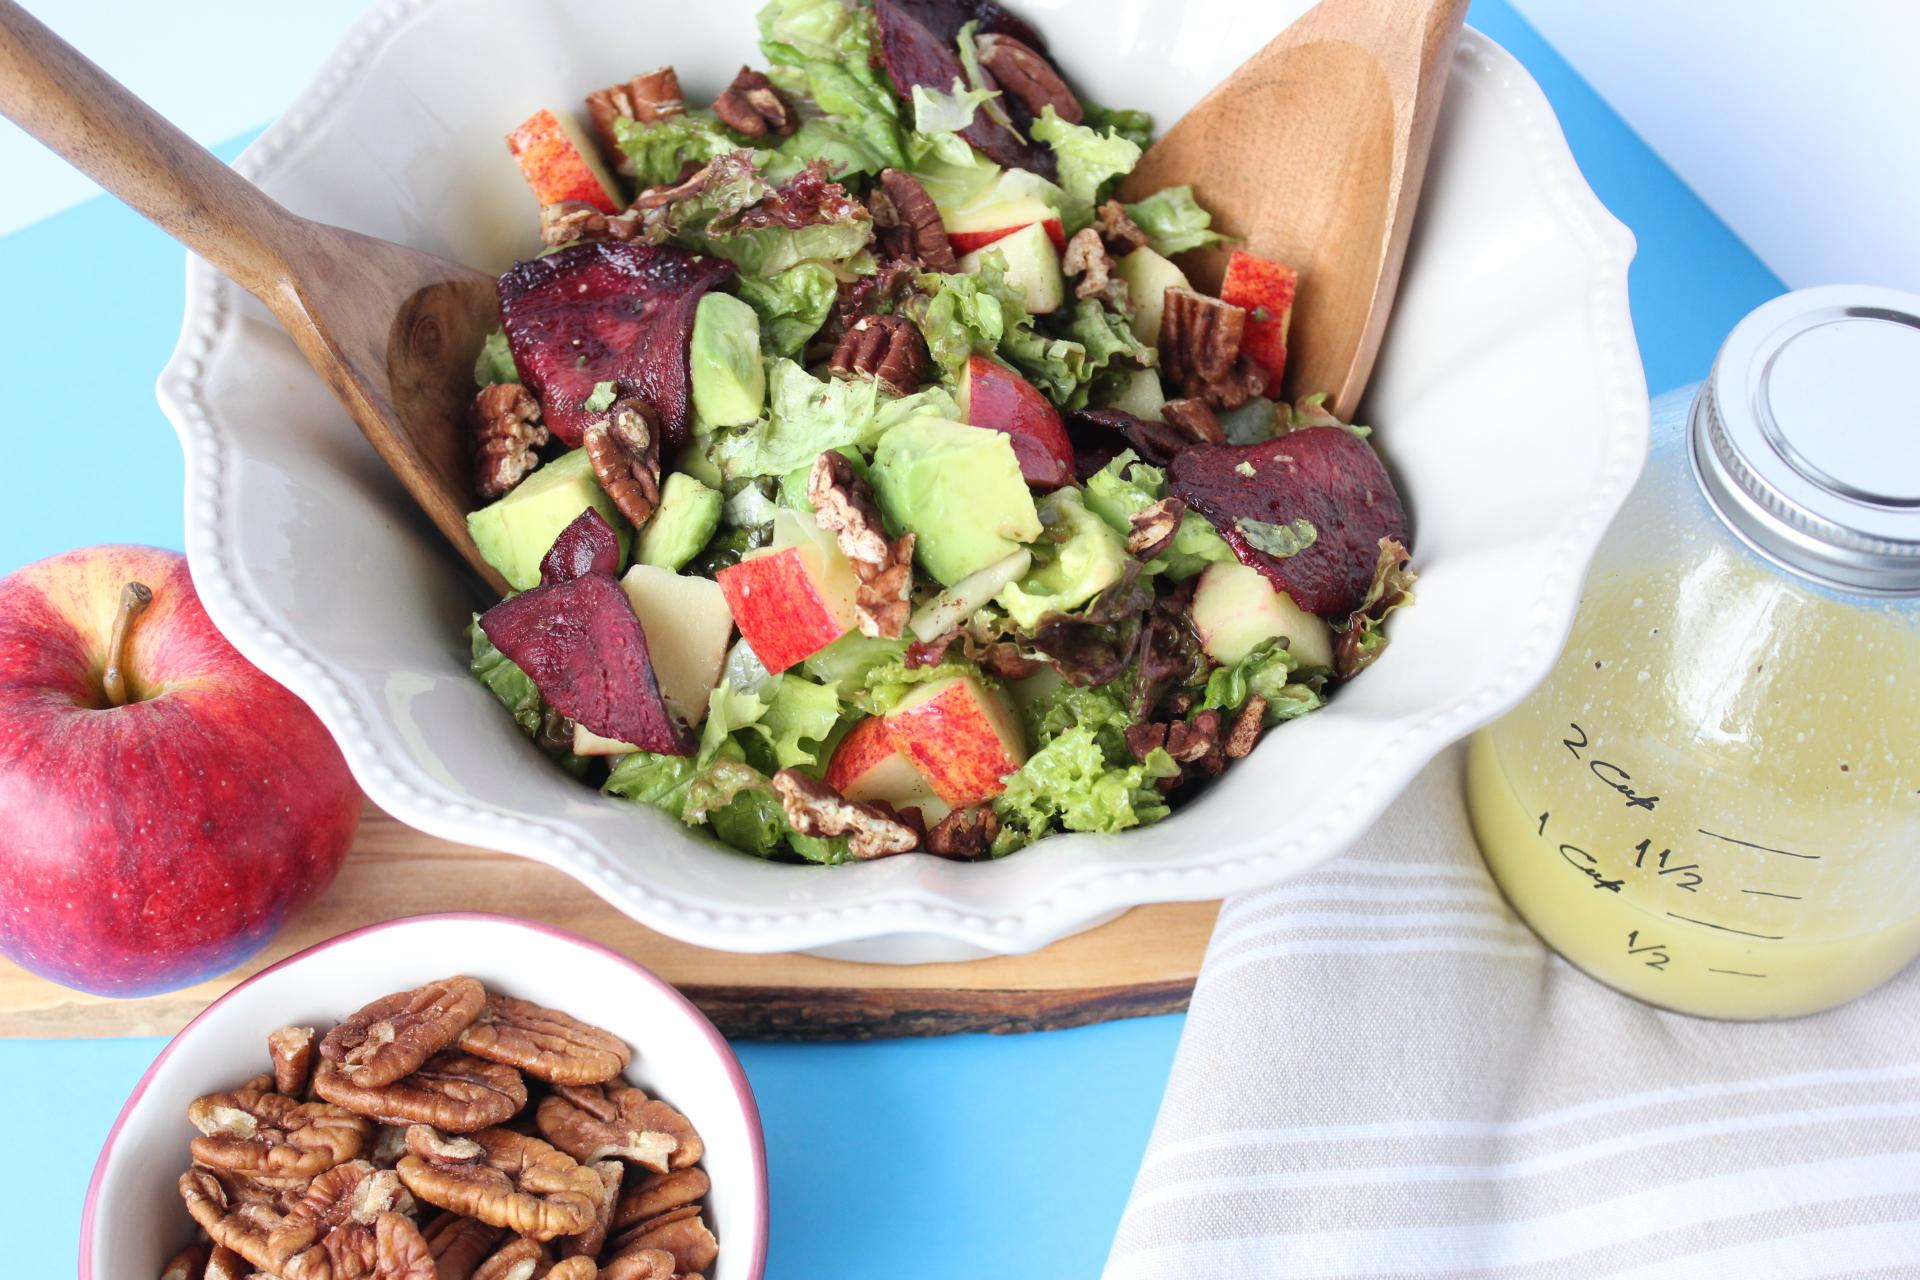 RECIPE: Roasted Beet & Apple Salad, Detoxing 101